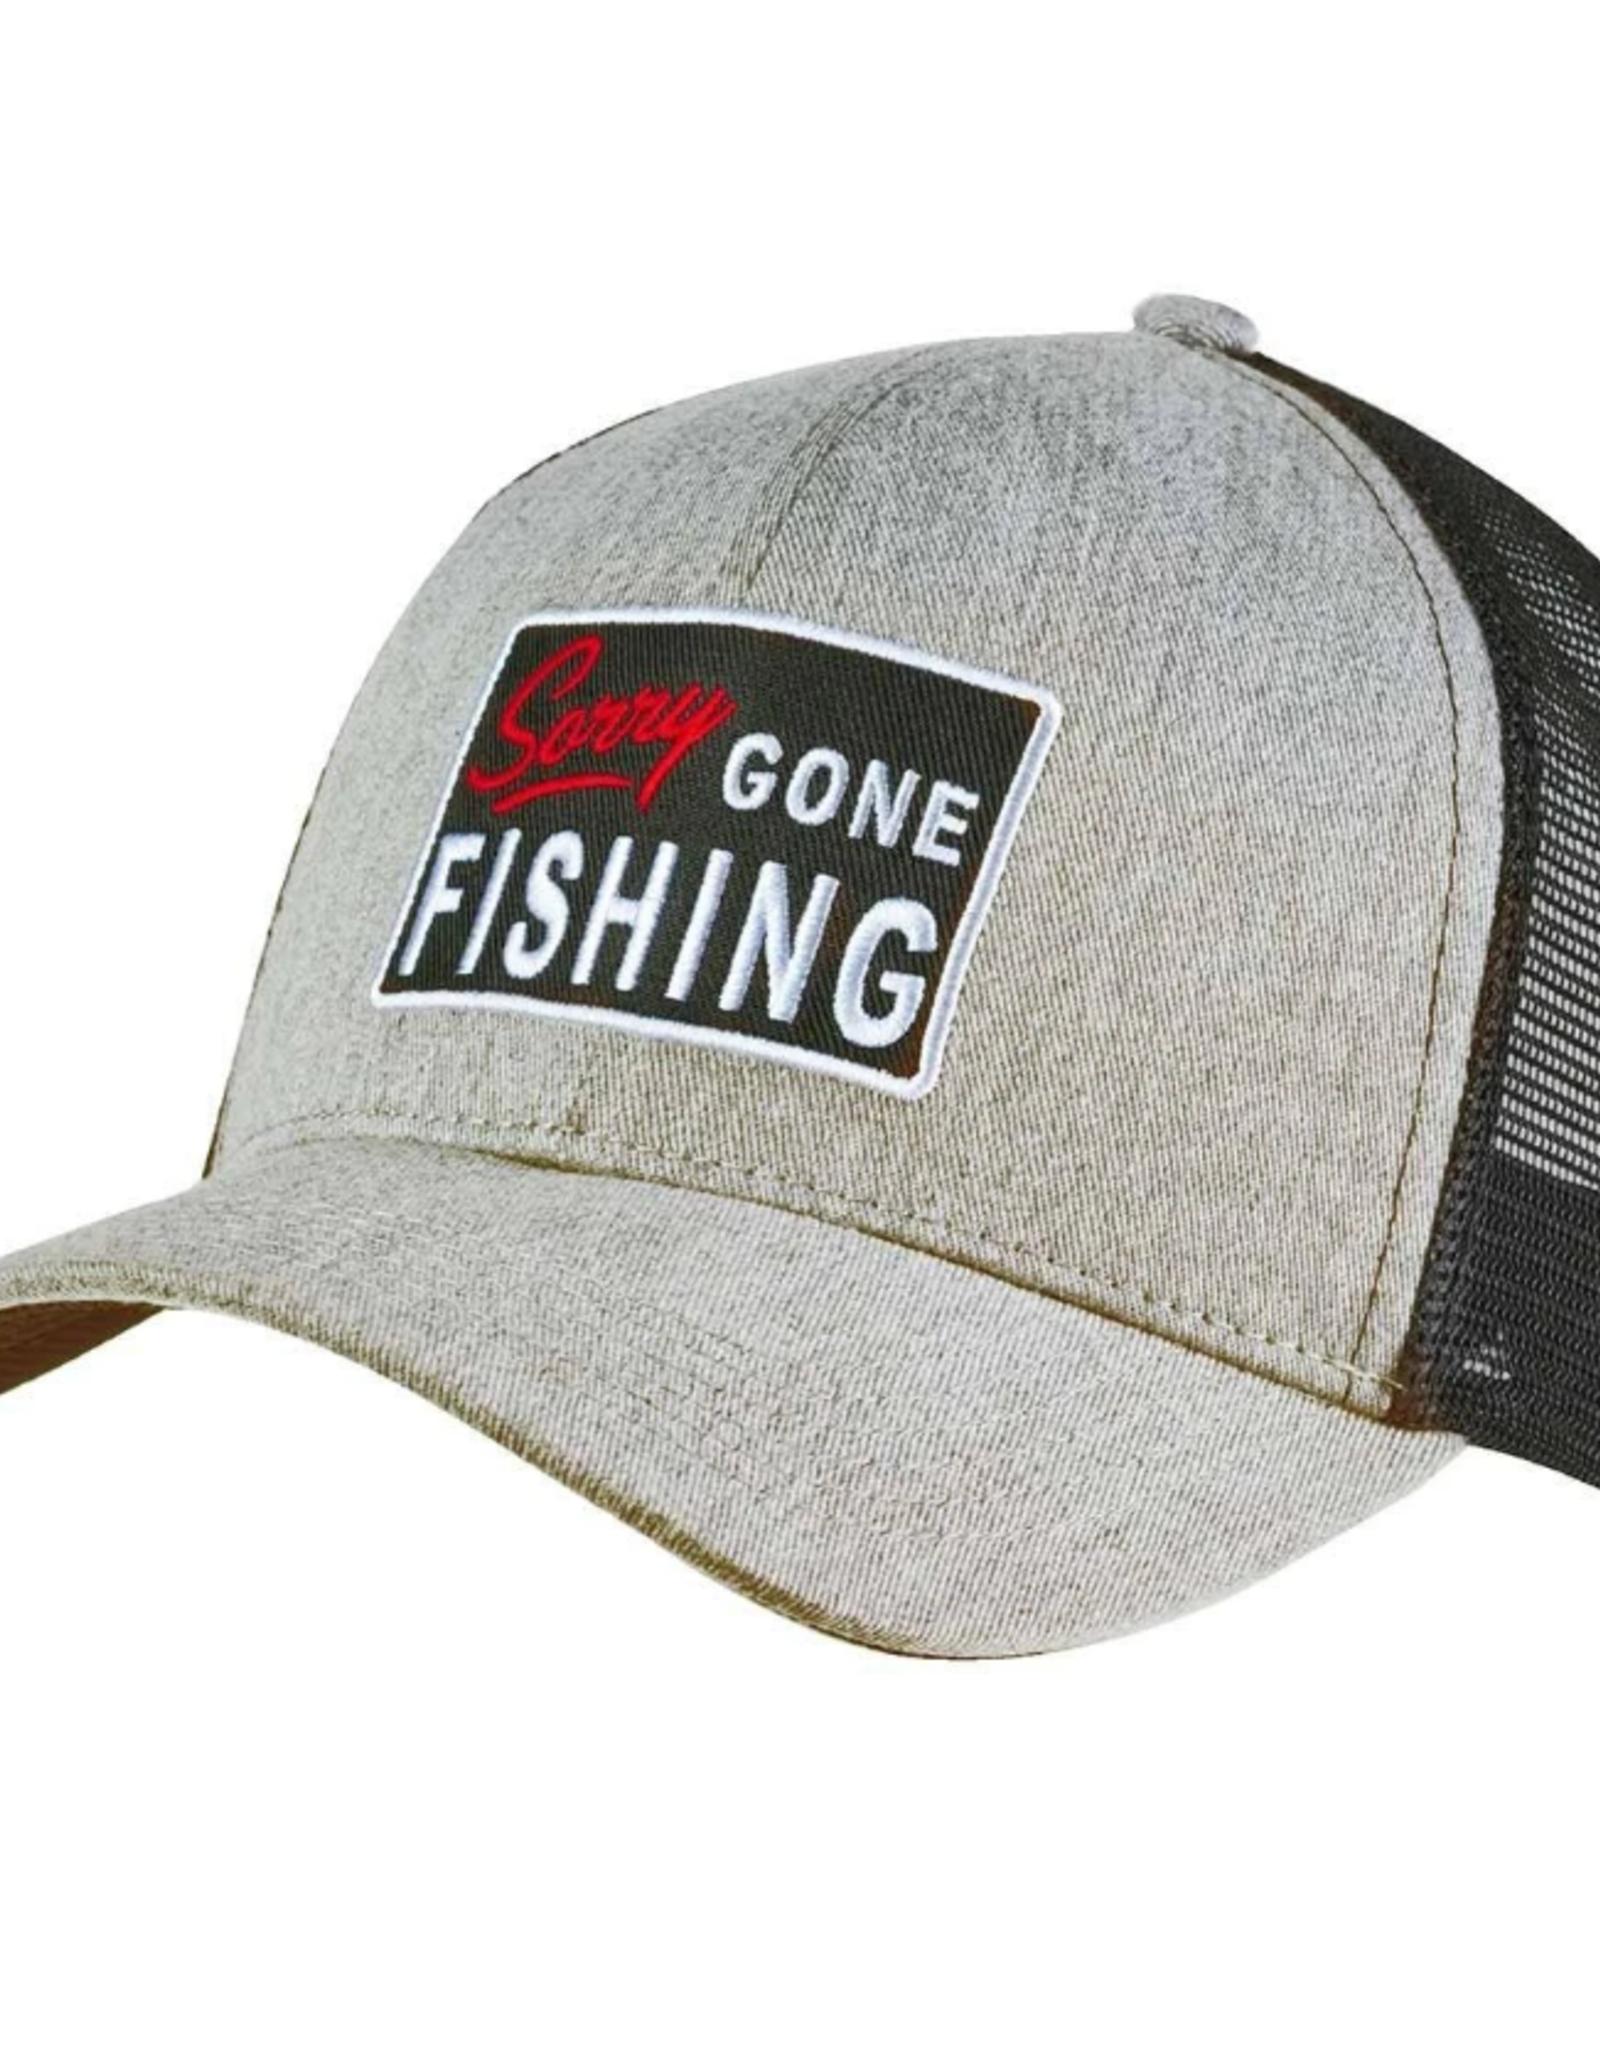 Avid Gone Fishing Trucker Heather Gray